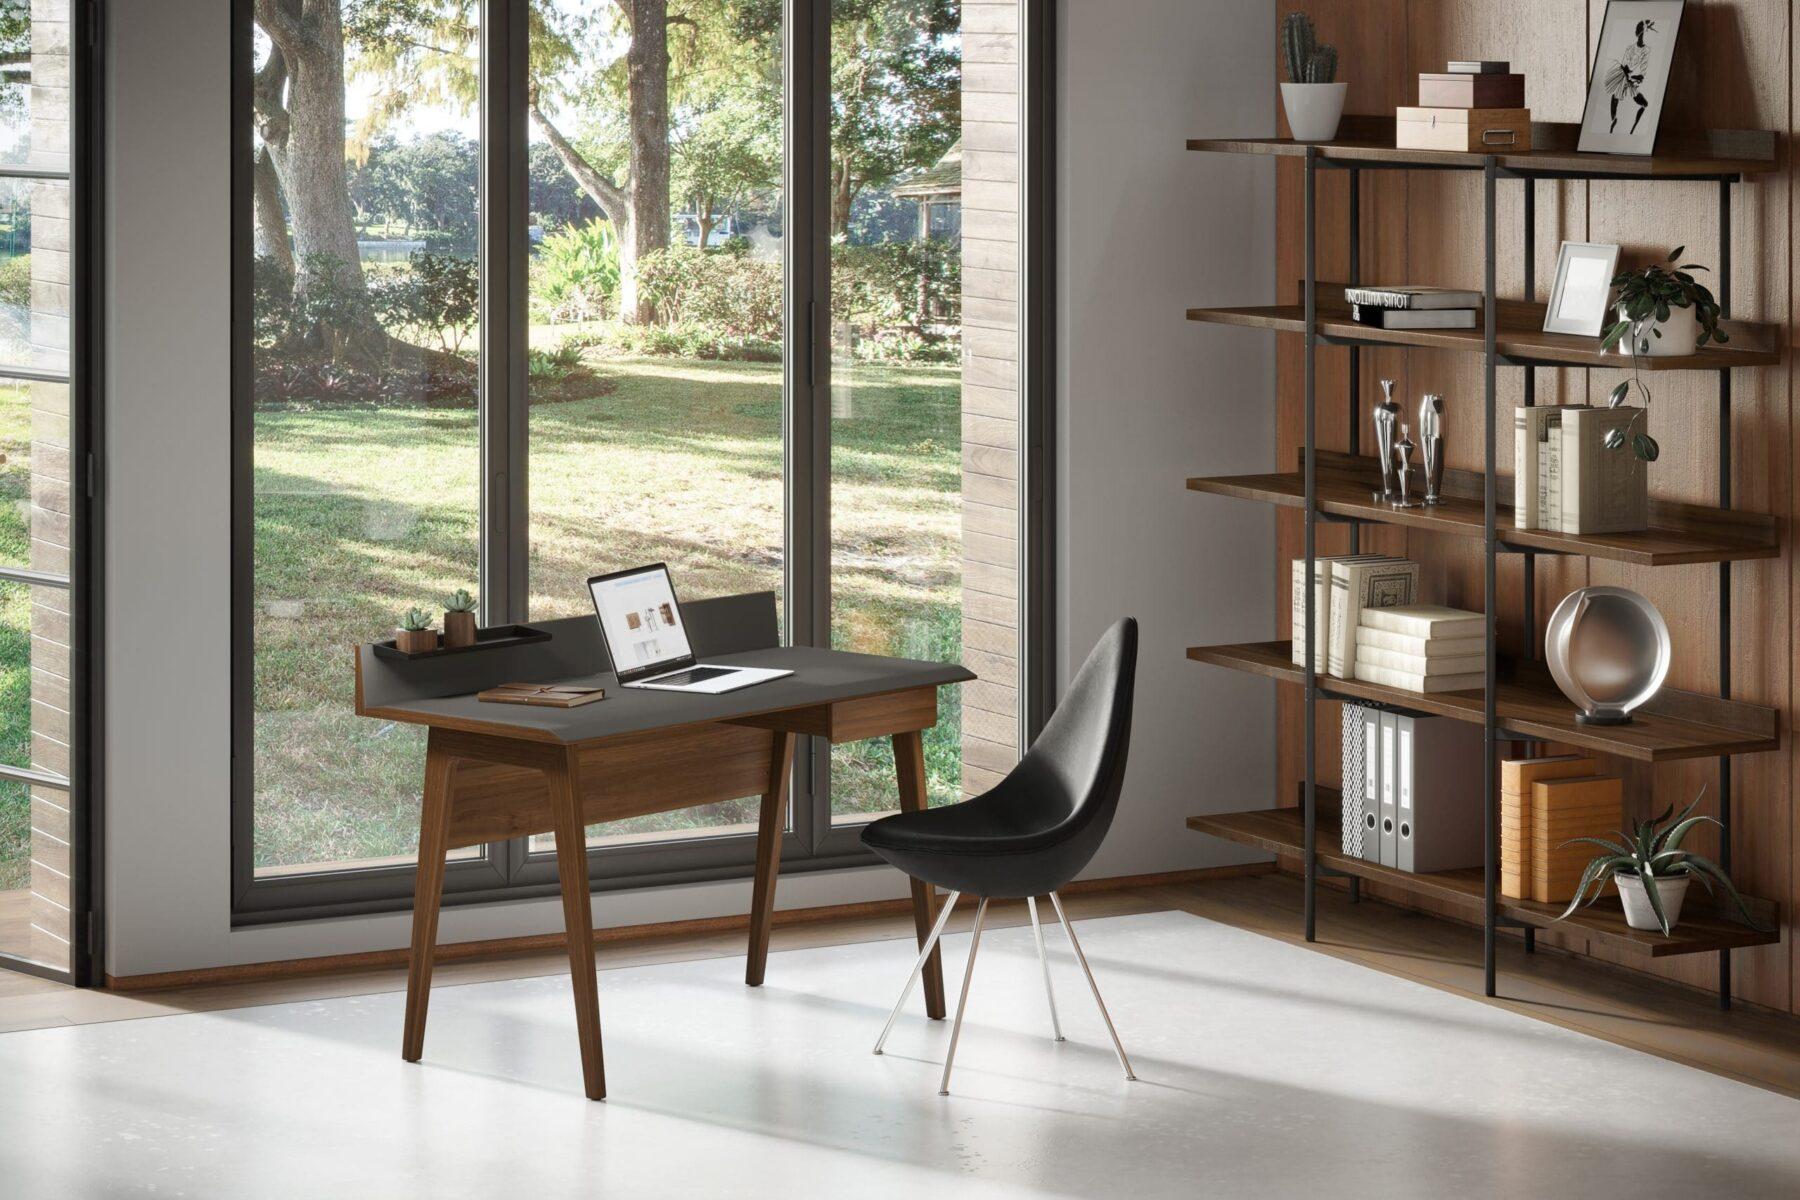 bevel-6743-BDI-modern-desk-TWL-LS1